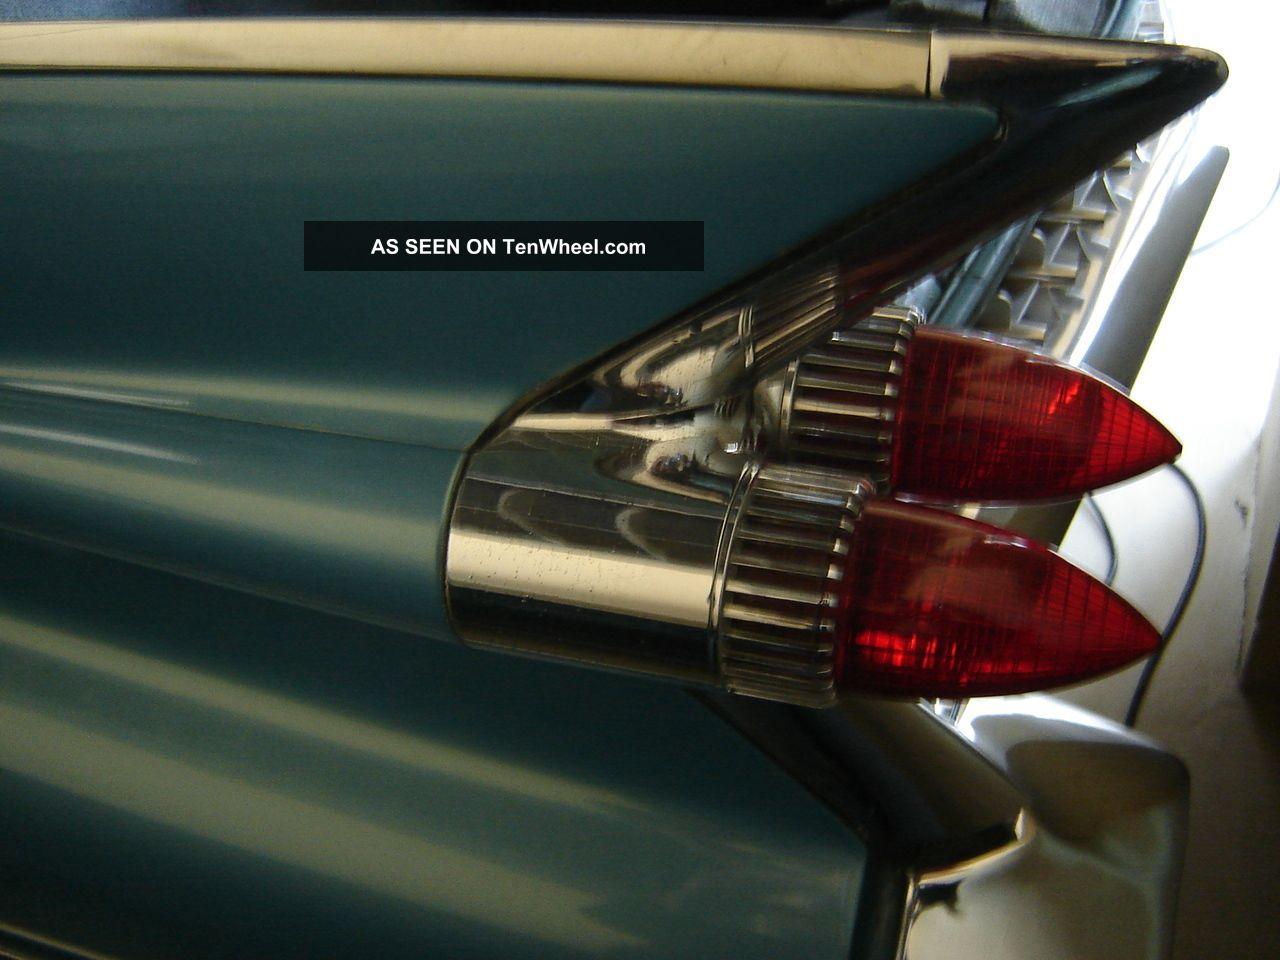 1959 Cadillac Coupe De Ville Other photo